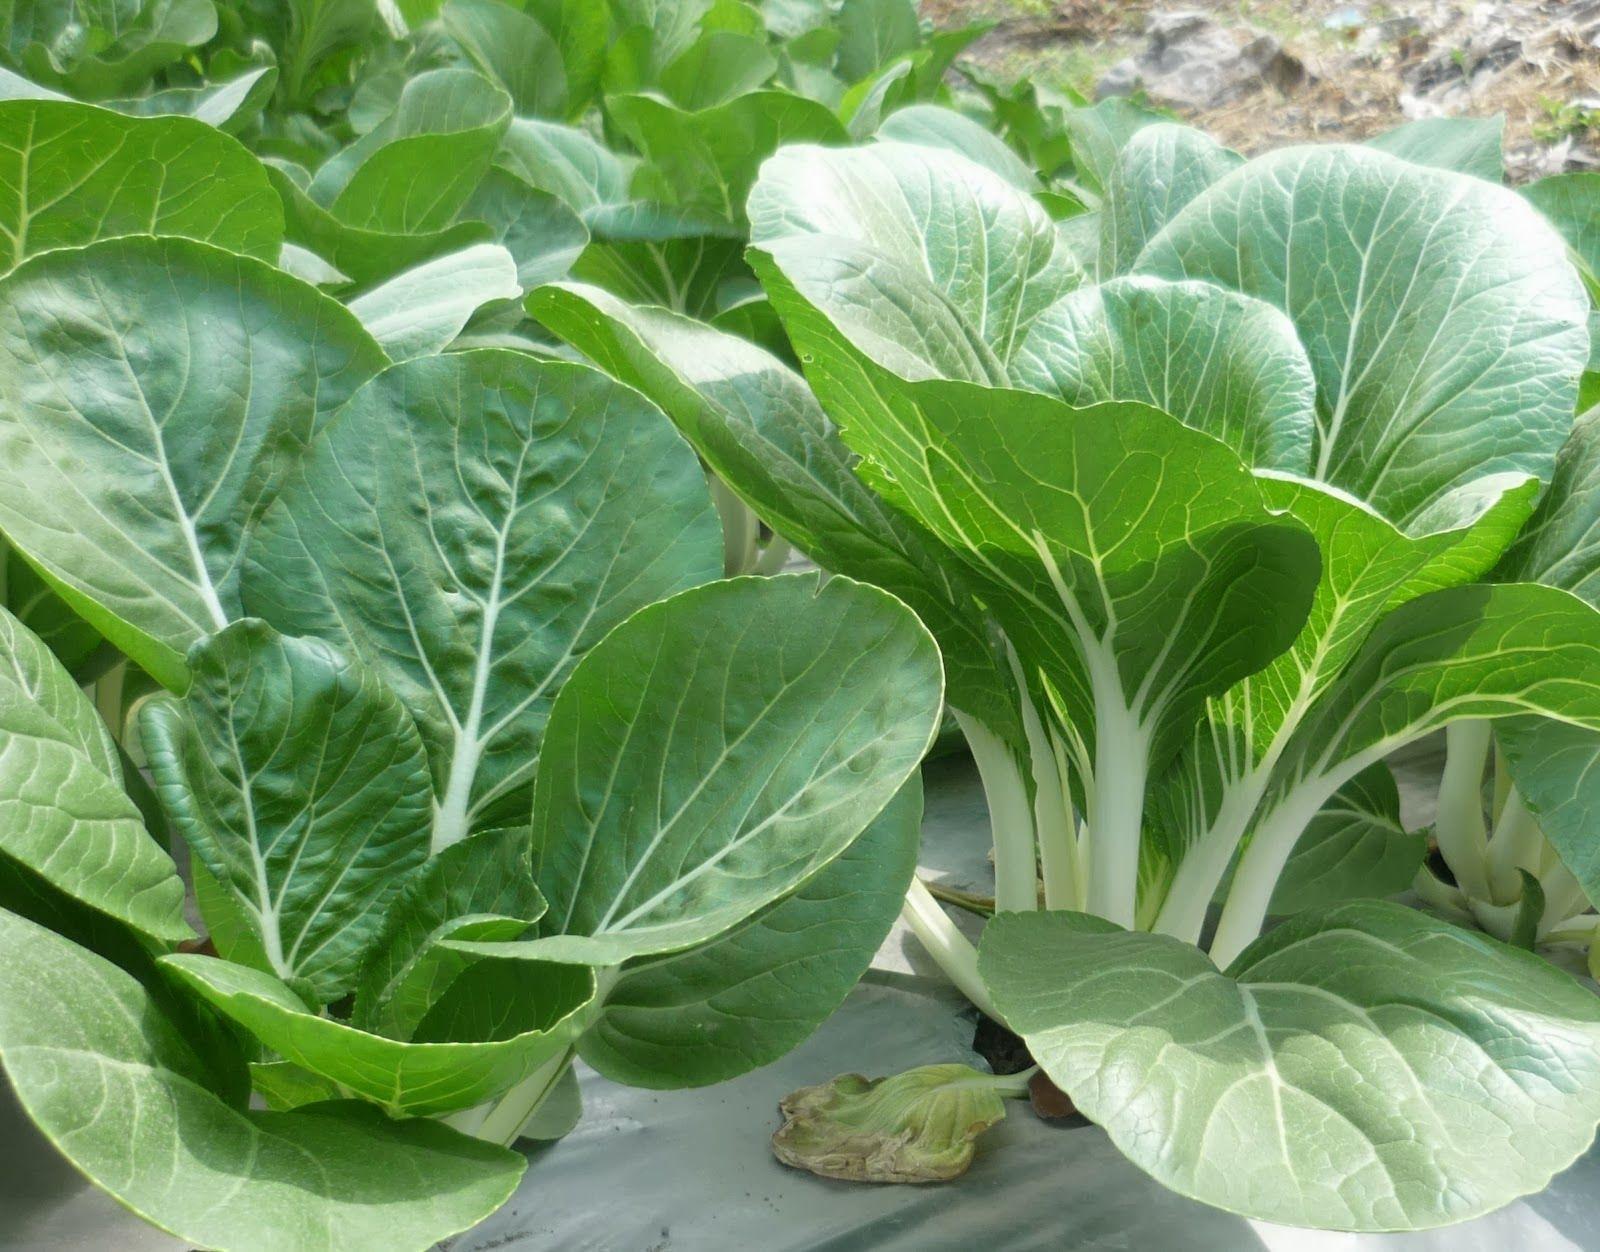 Artikel Sayuran Organik Tips Dan Trik Sawi Kolom Benih Bibit Herbs Catnip Common Haira Seed Cap Vegetables Blogging